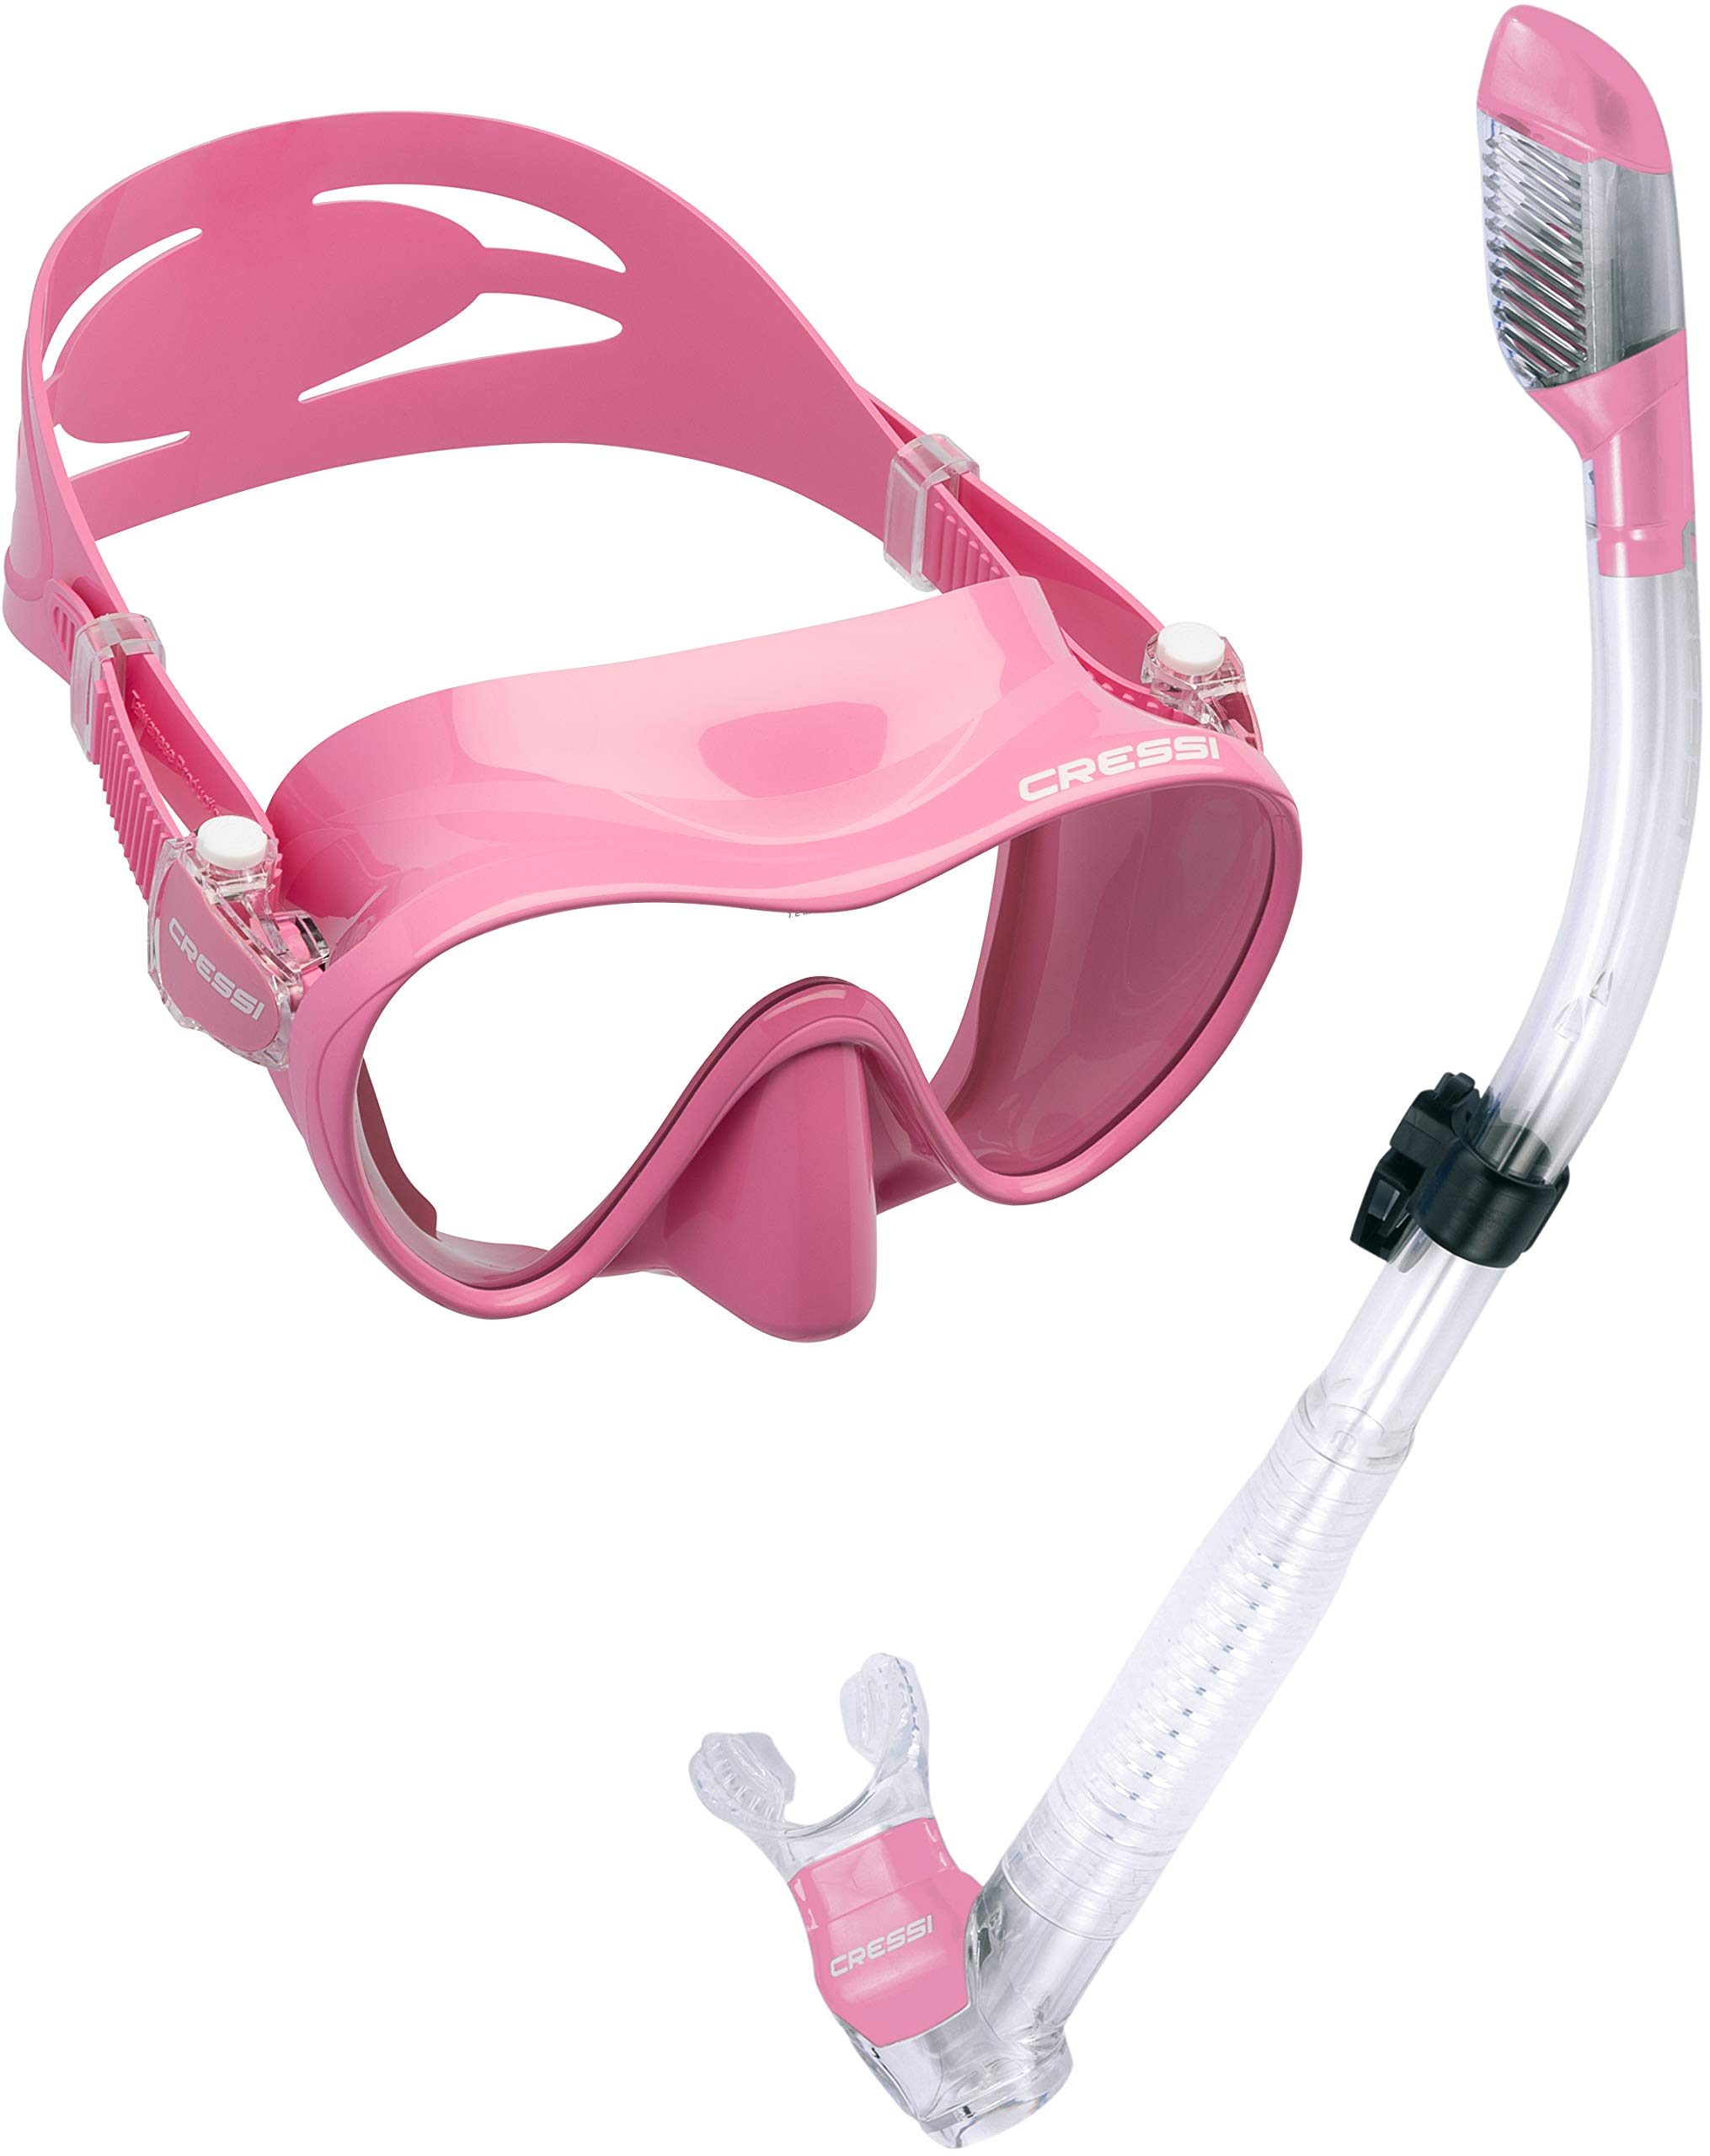 Cressi Scuba Diving Snorkeling Freediving Mask Snorkel Set, Pink by Cressi